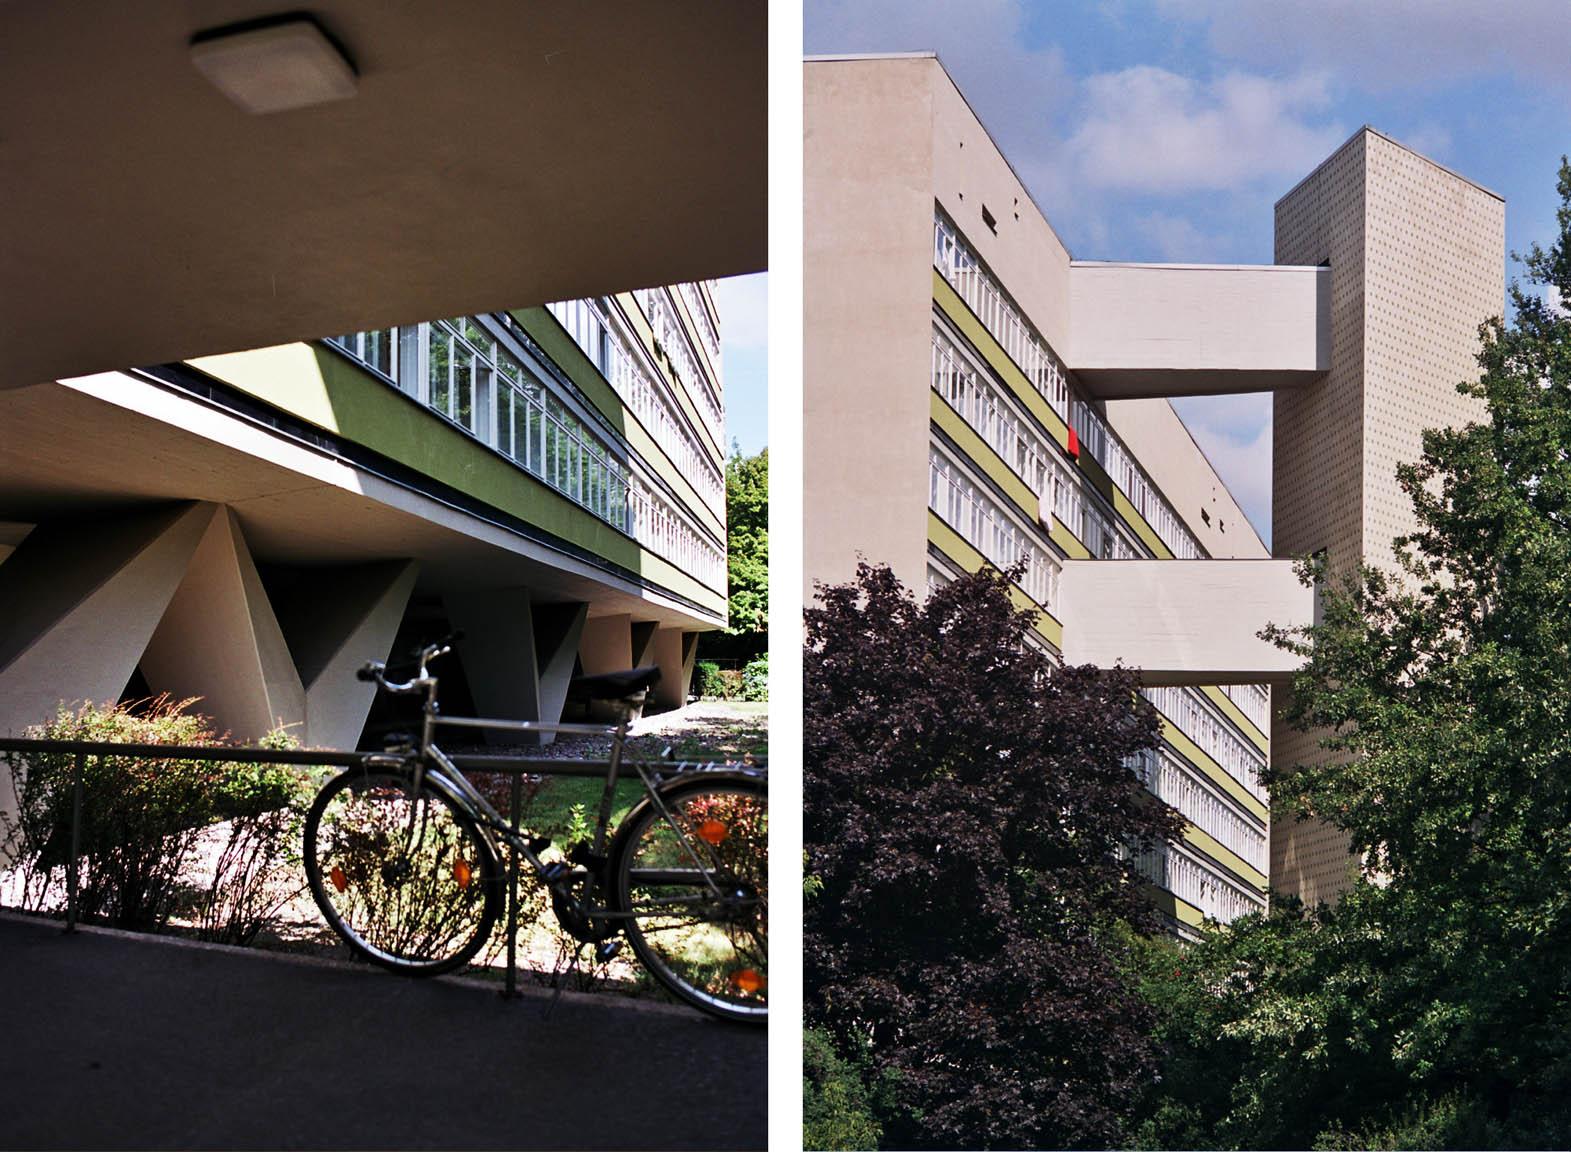 Hansaviertel_Niemeyer_06.jpg